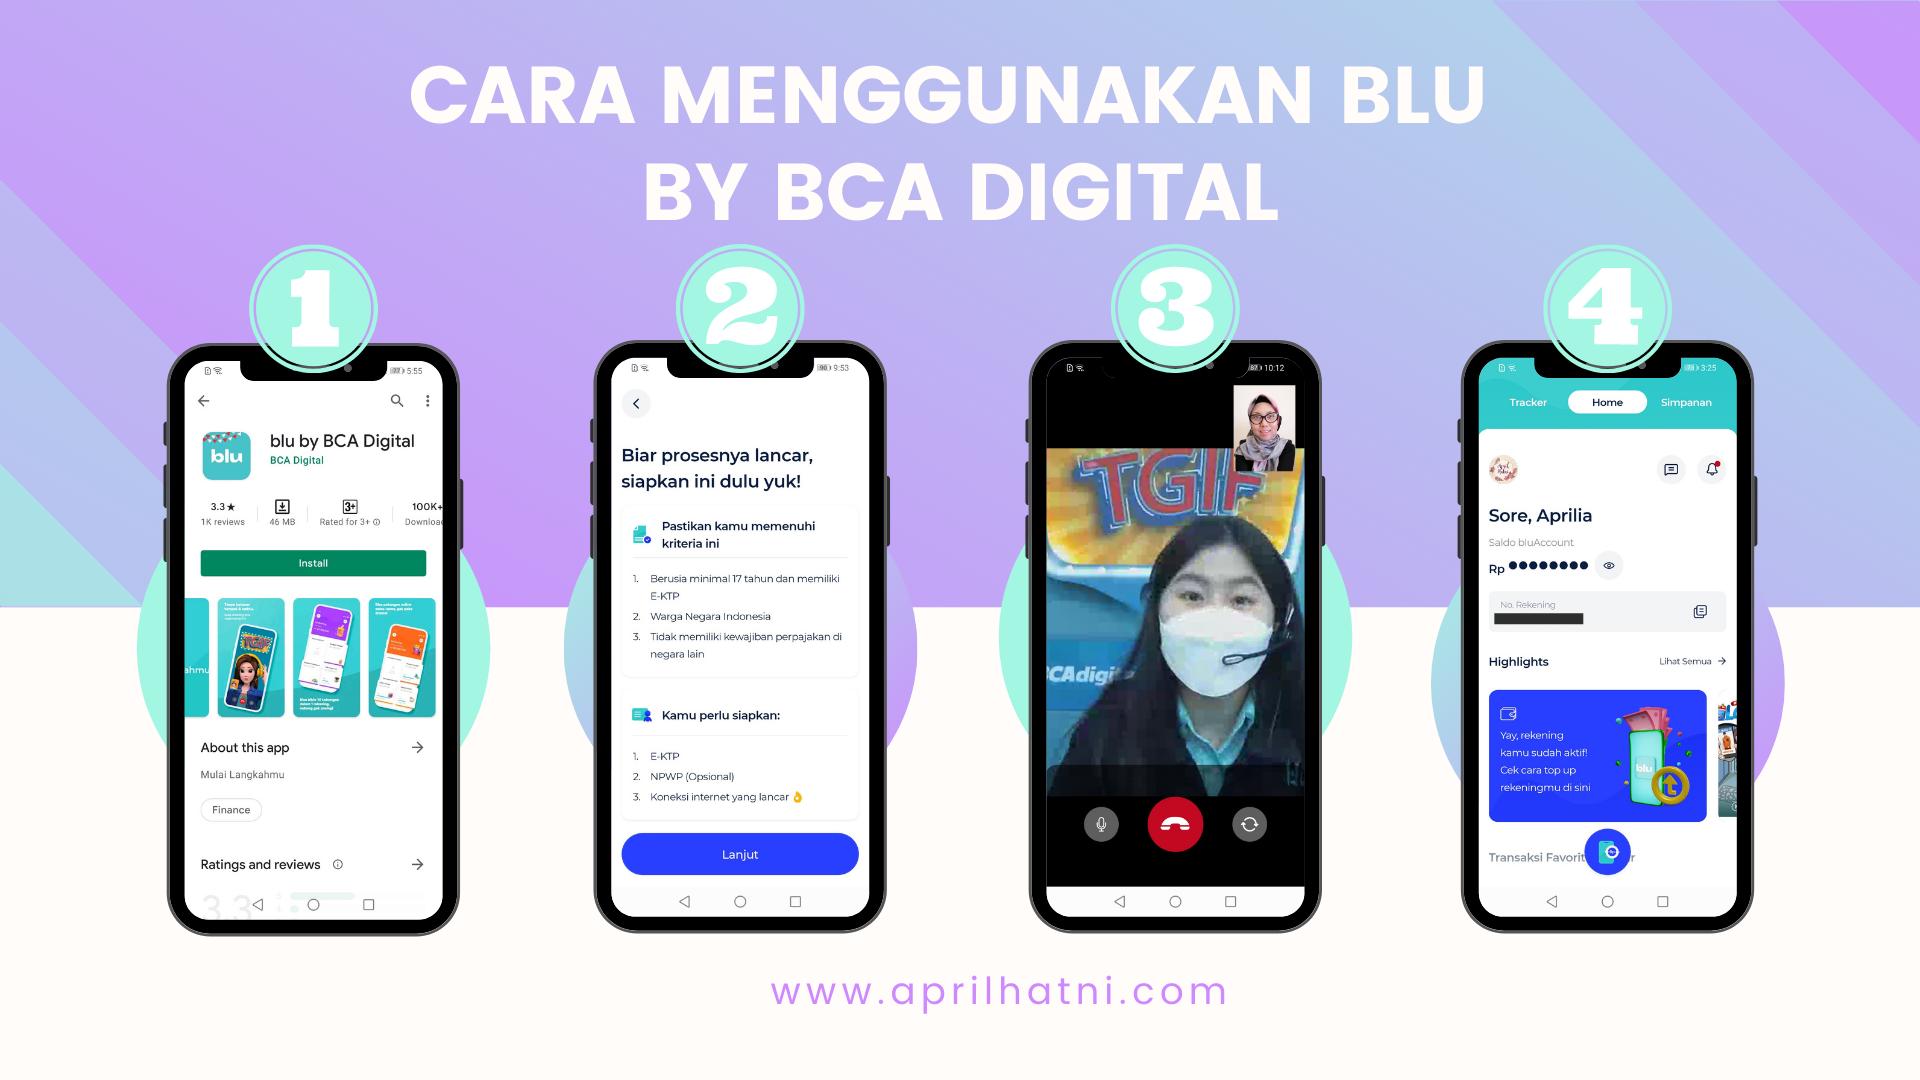 cara menggunakan aplikasi blu by bca digital